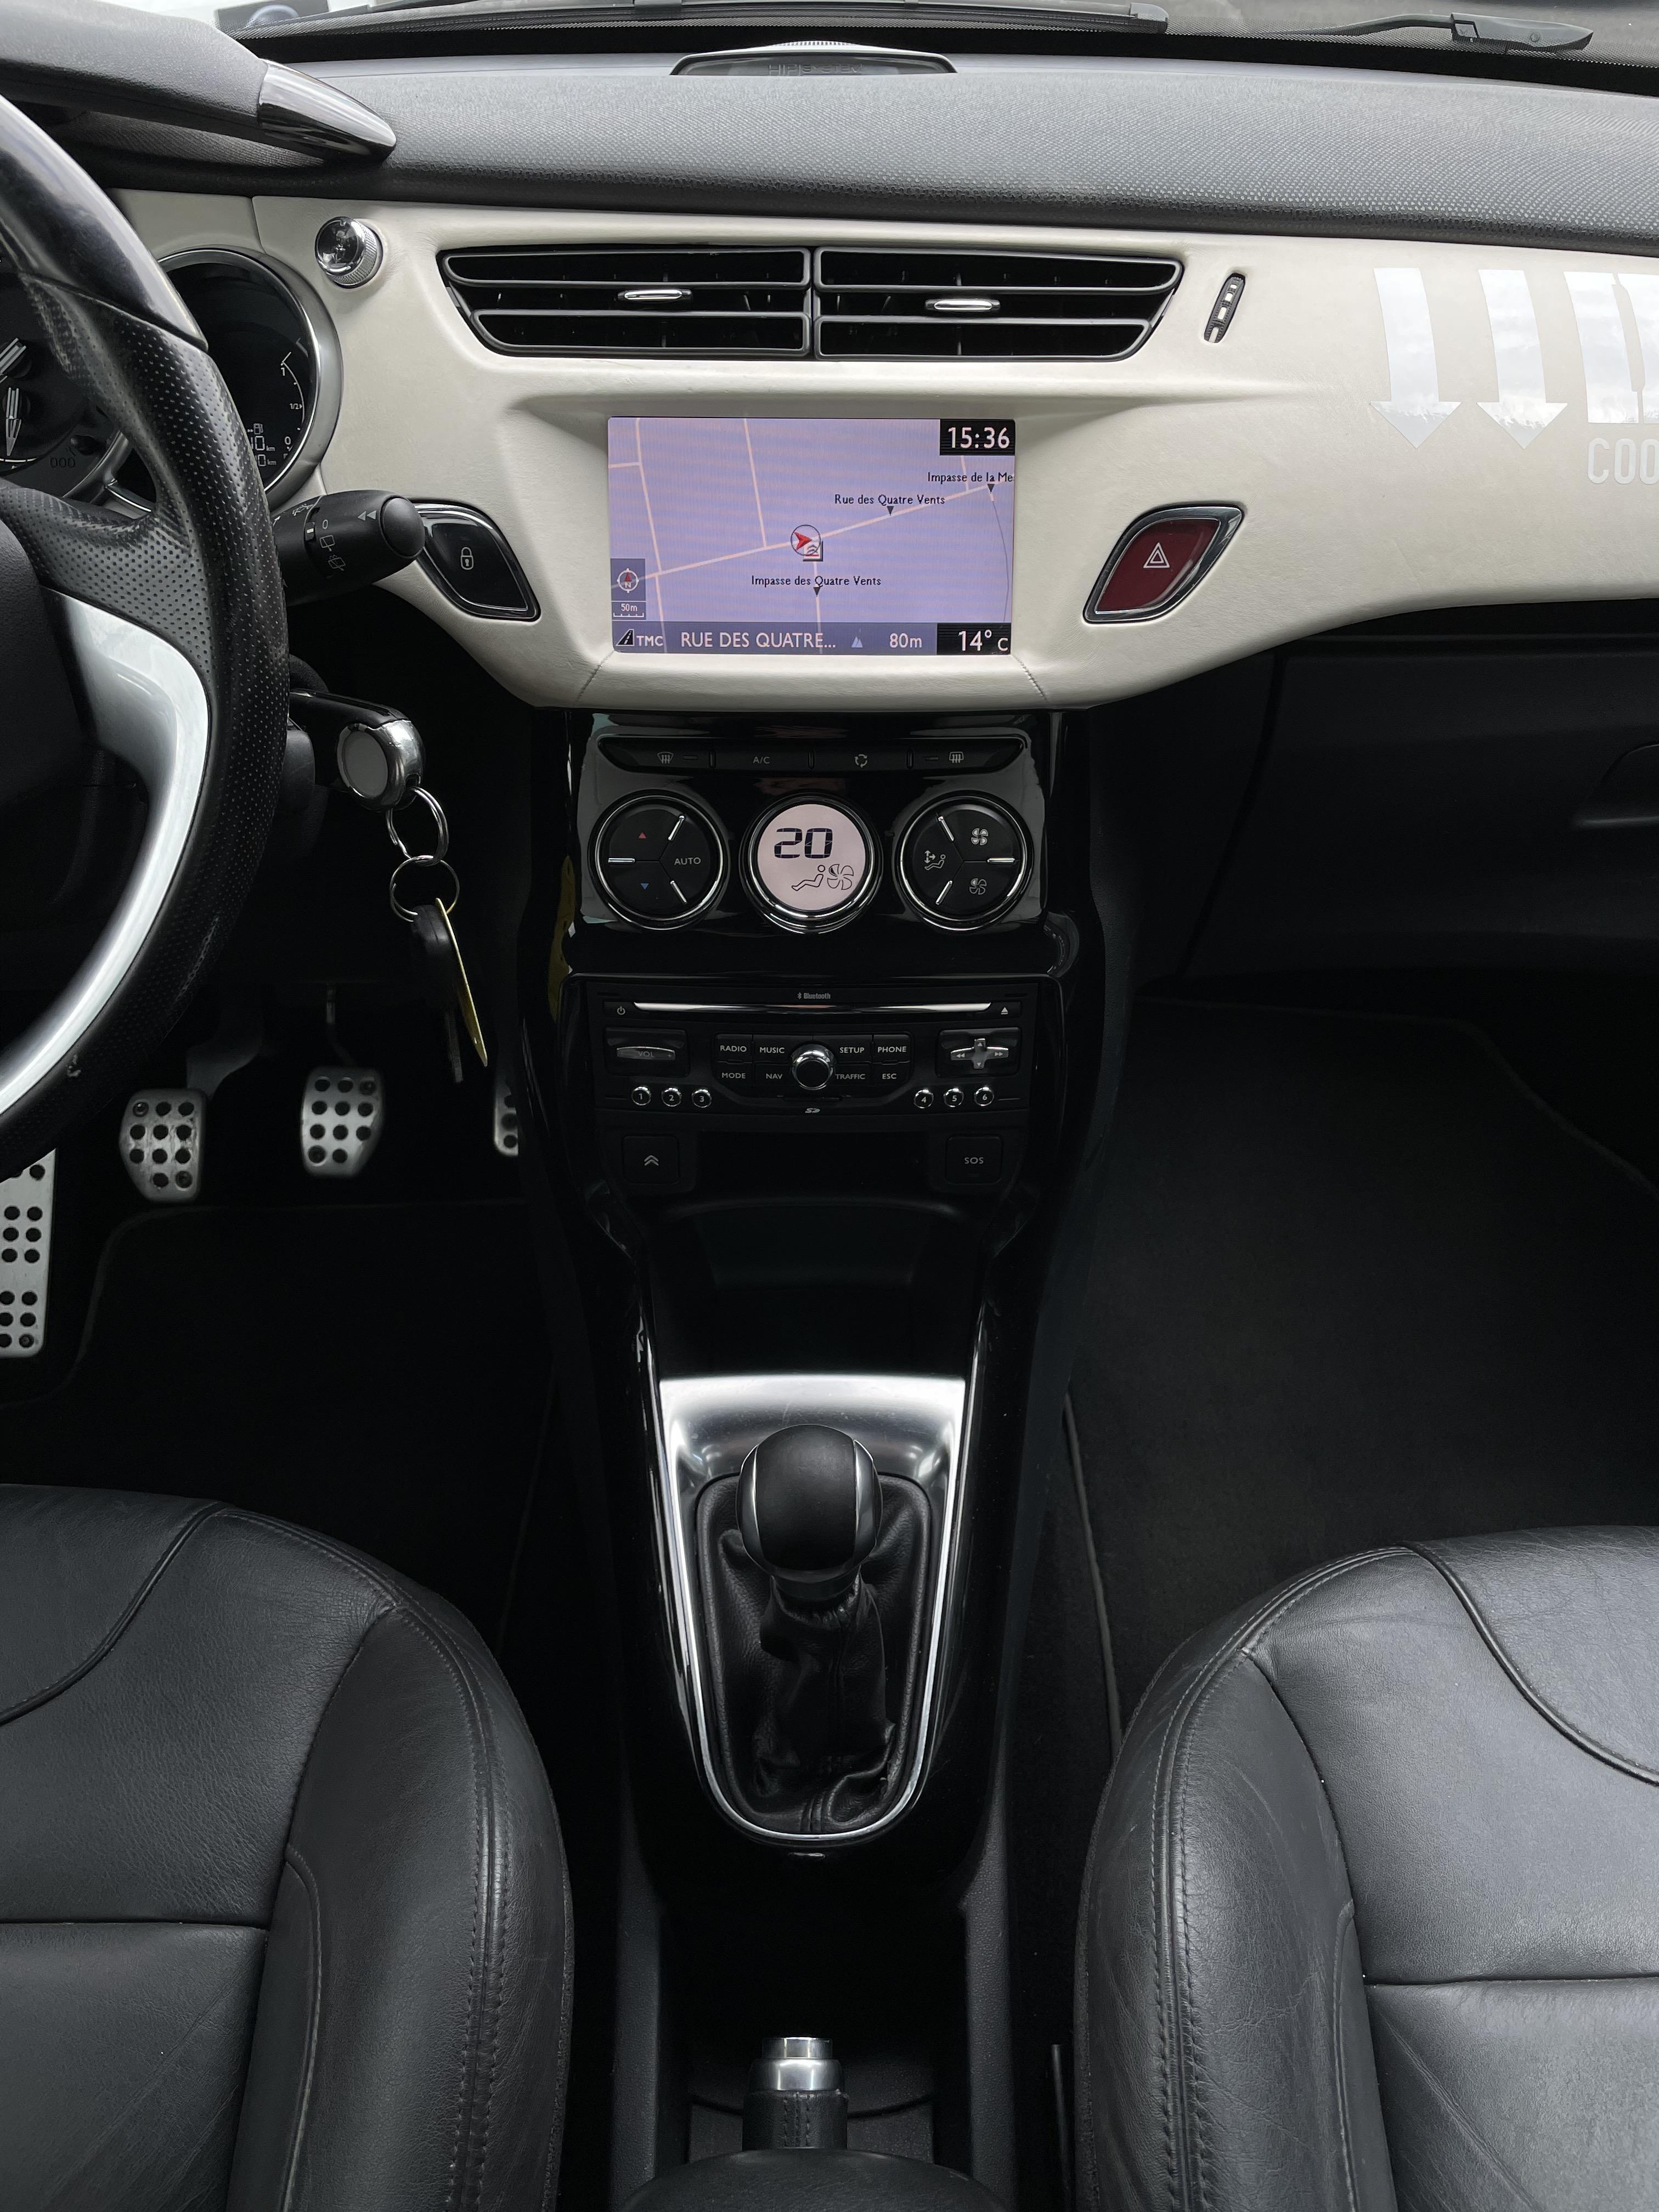 DS 3 1 6 e-hdi 92 GPS CUIR BRACELET LED HIFI